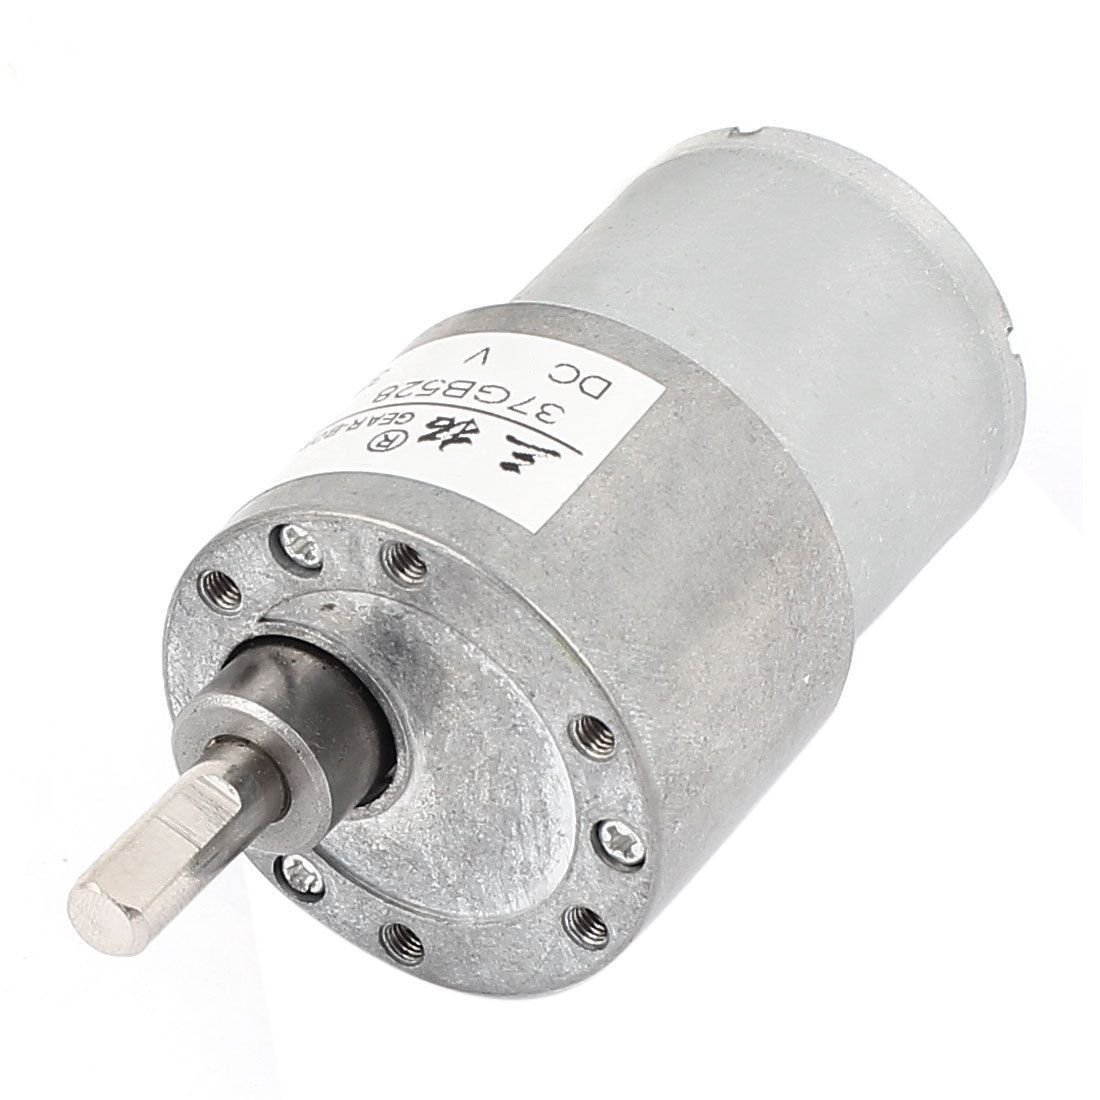 DC 12V 220RPM 0.2A 0.4KG.cm High Torque DC Gear Box Reducer Variable Speed Motor